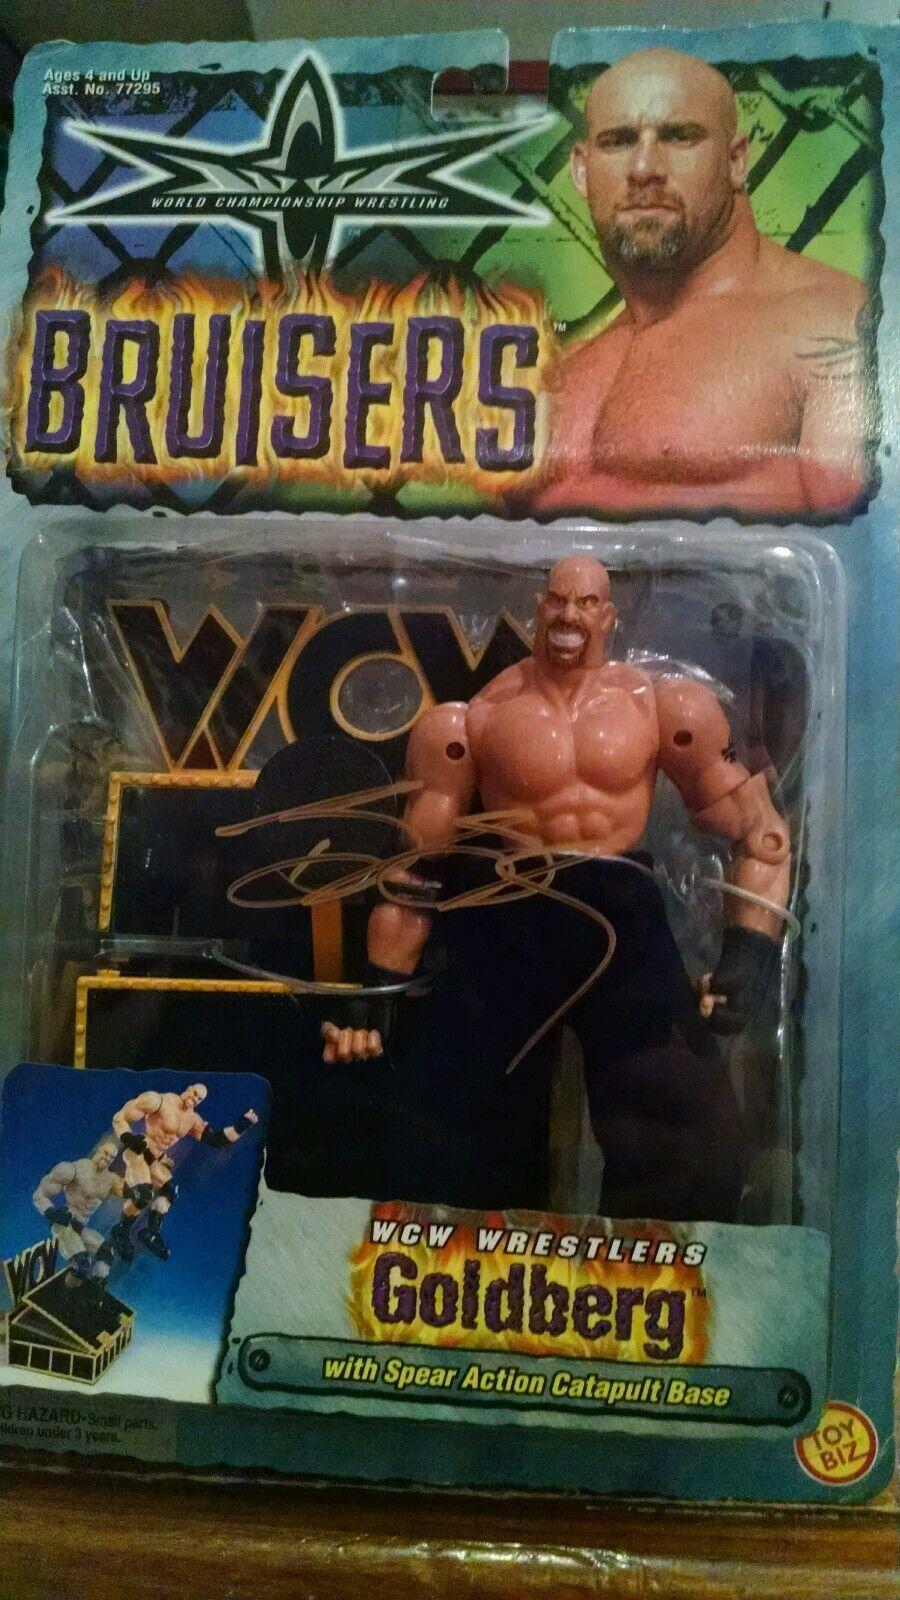 1999 Bill goldberg gold Autographed WCW WWE WWF Bruisers Action figure